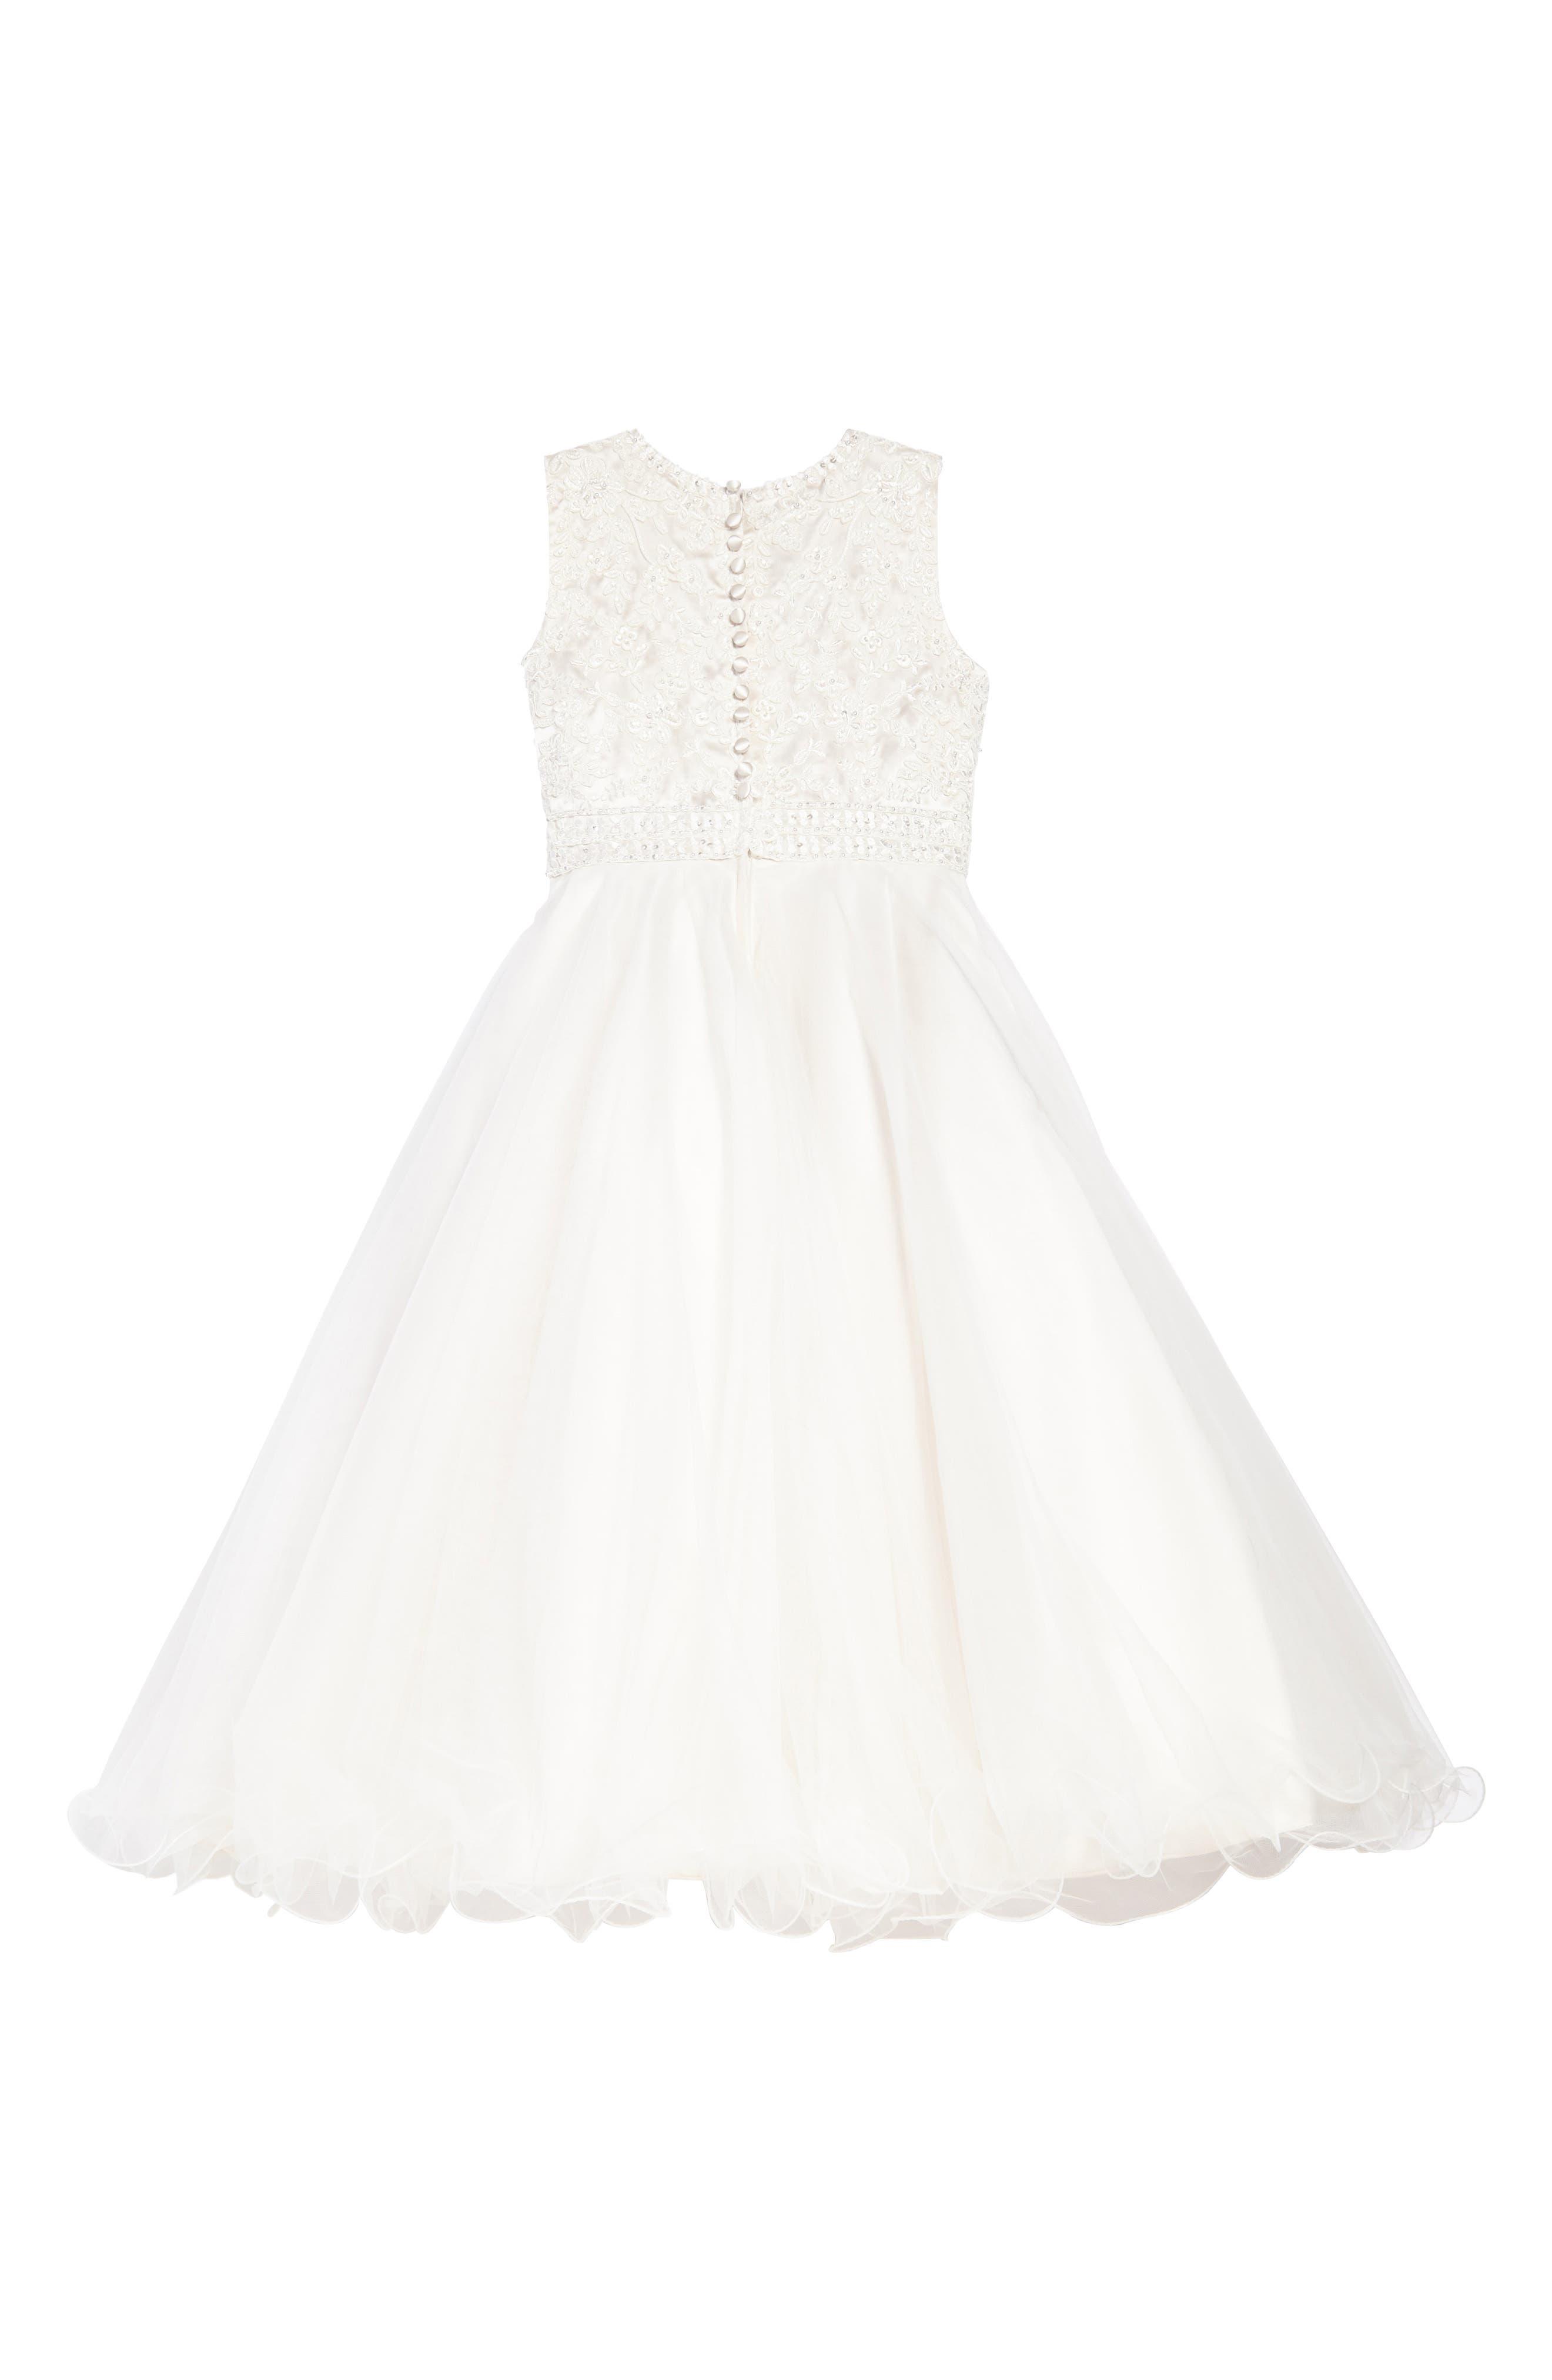 Lace & Tulle Dress,                             Alternate thumbnail 2, color,                             900